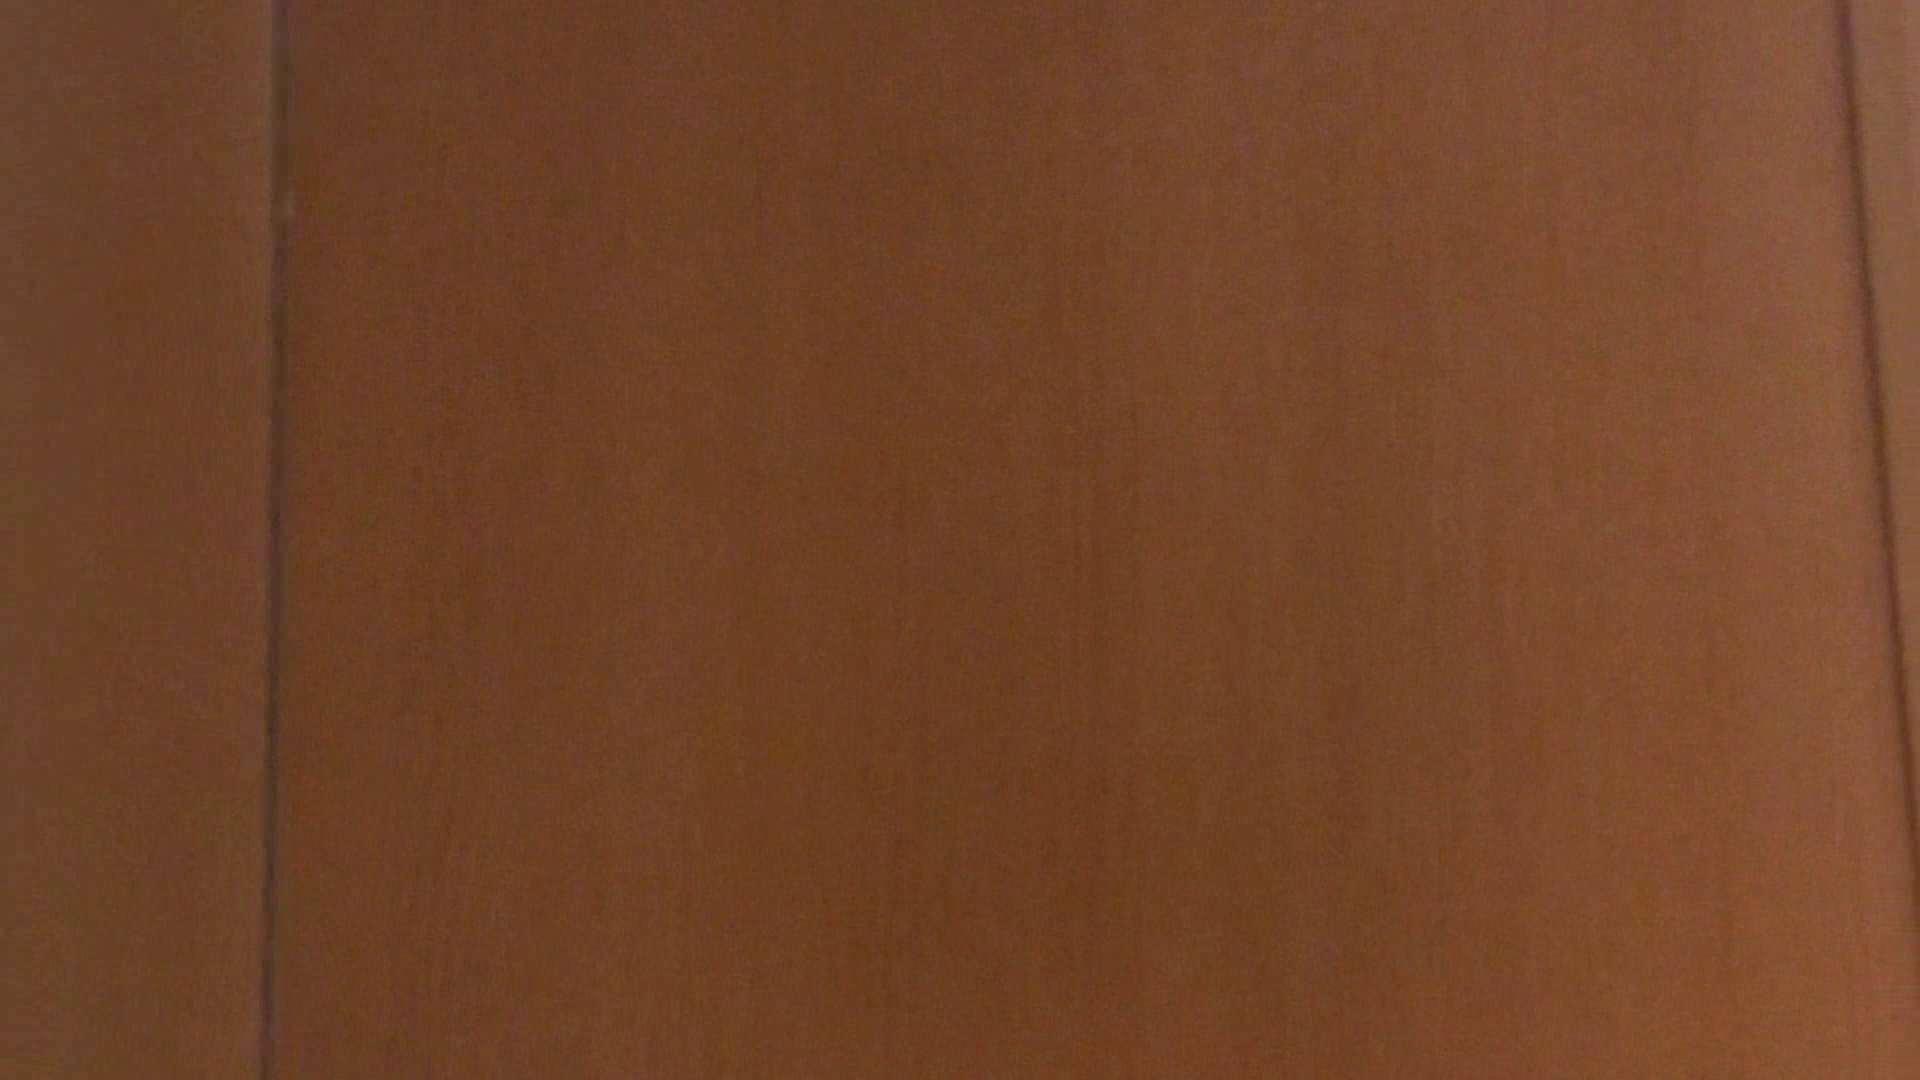 「噂」の国の厠観察日記2 Vol.10 厠  51Pix 51